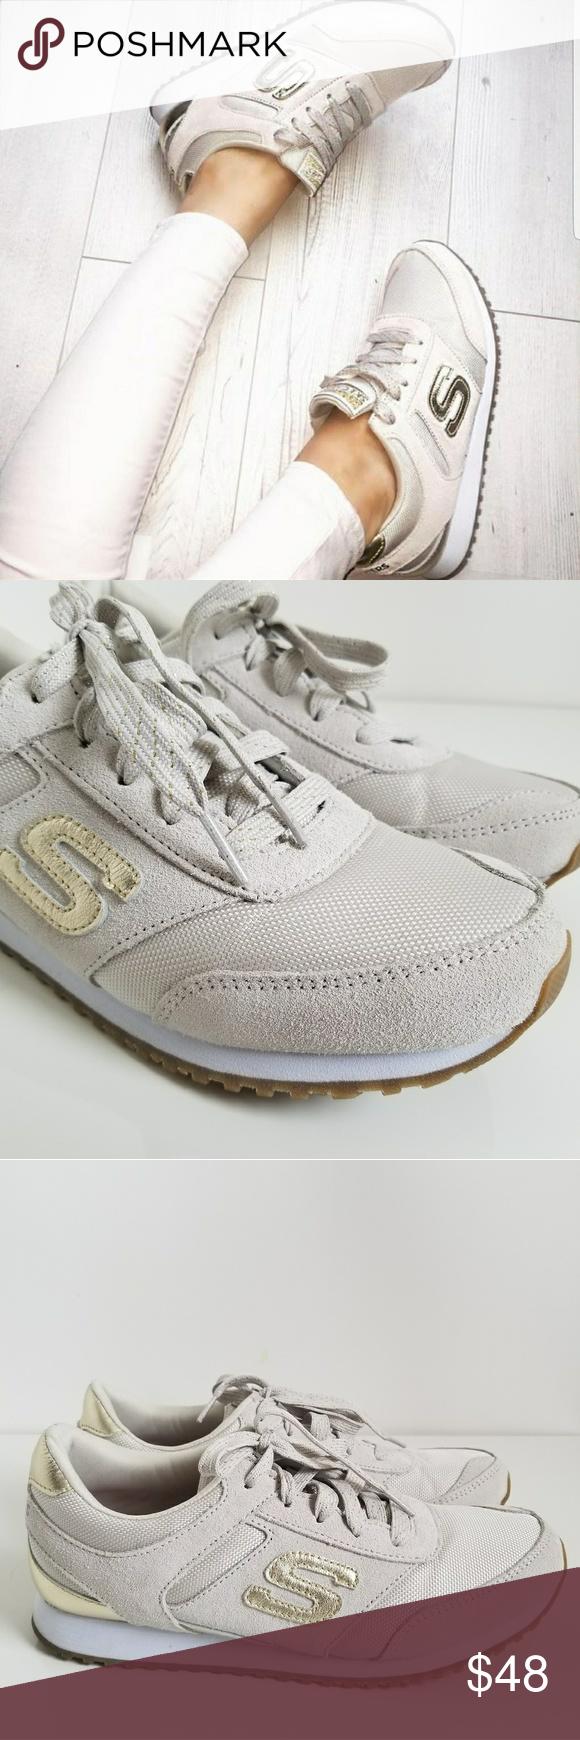 27ba08360a1c7 Skechers Womens Retros OG 78 - Gold Fever Style glitters like a disco ball  in the